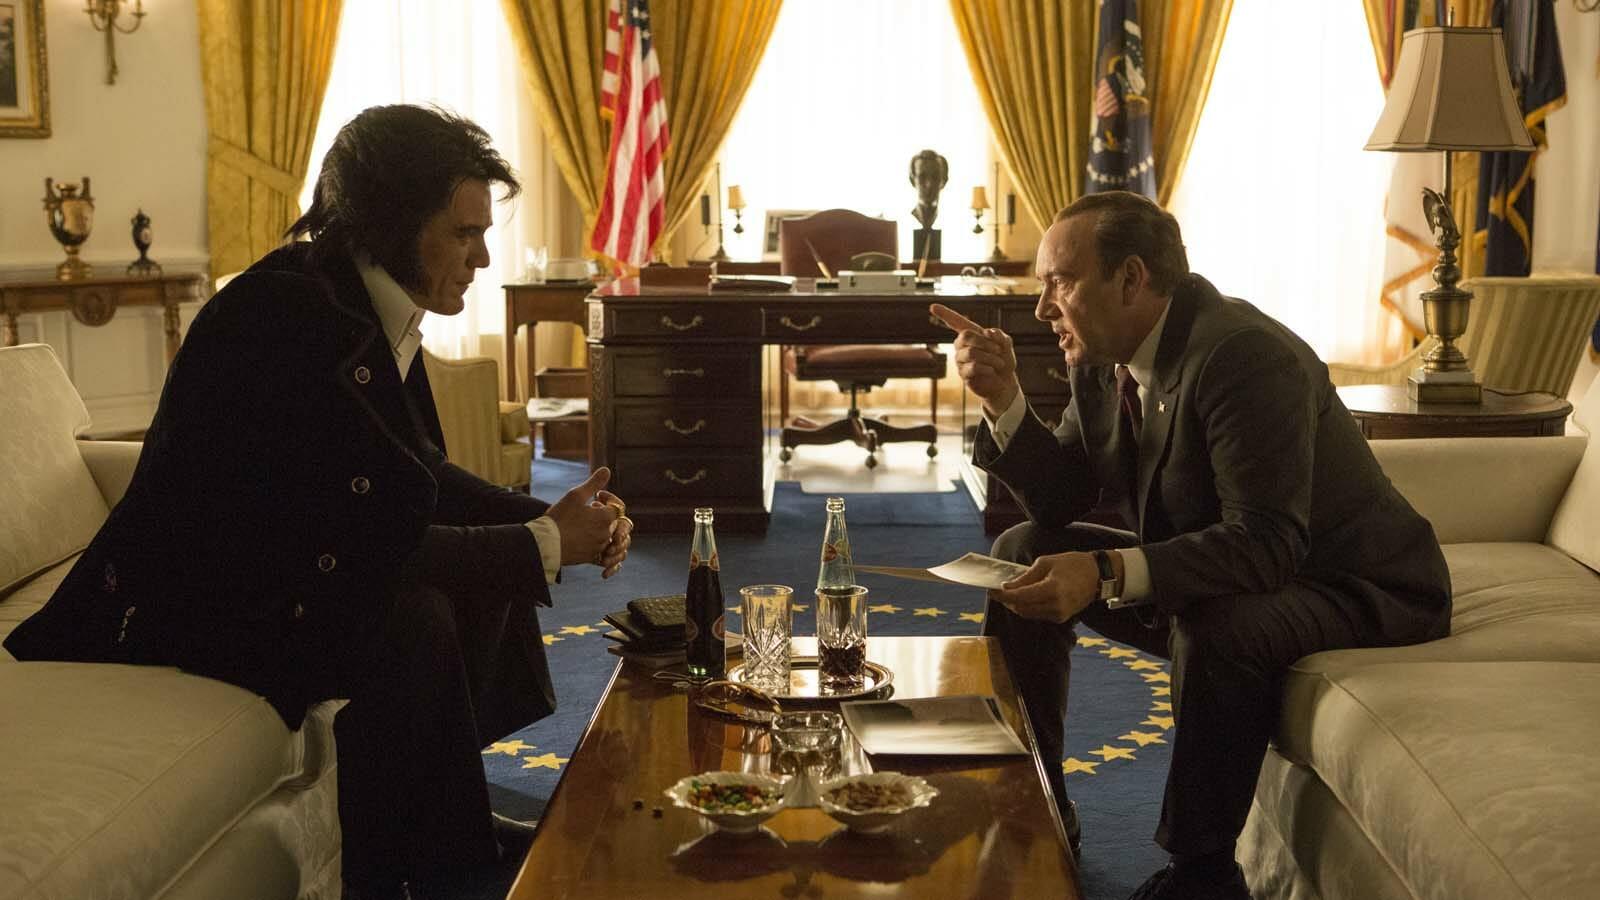 Elvis-&-Nixon-Kevin-Spacey-Michael-Shannon